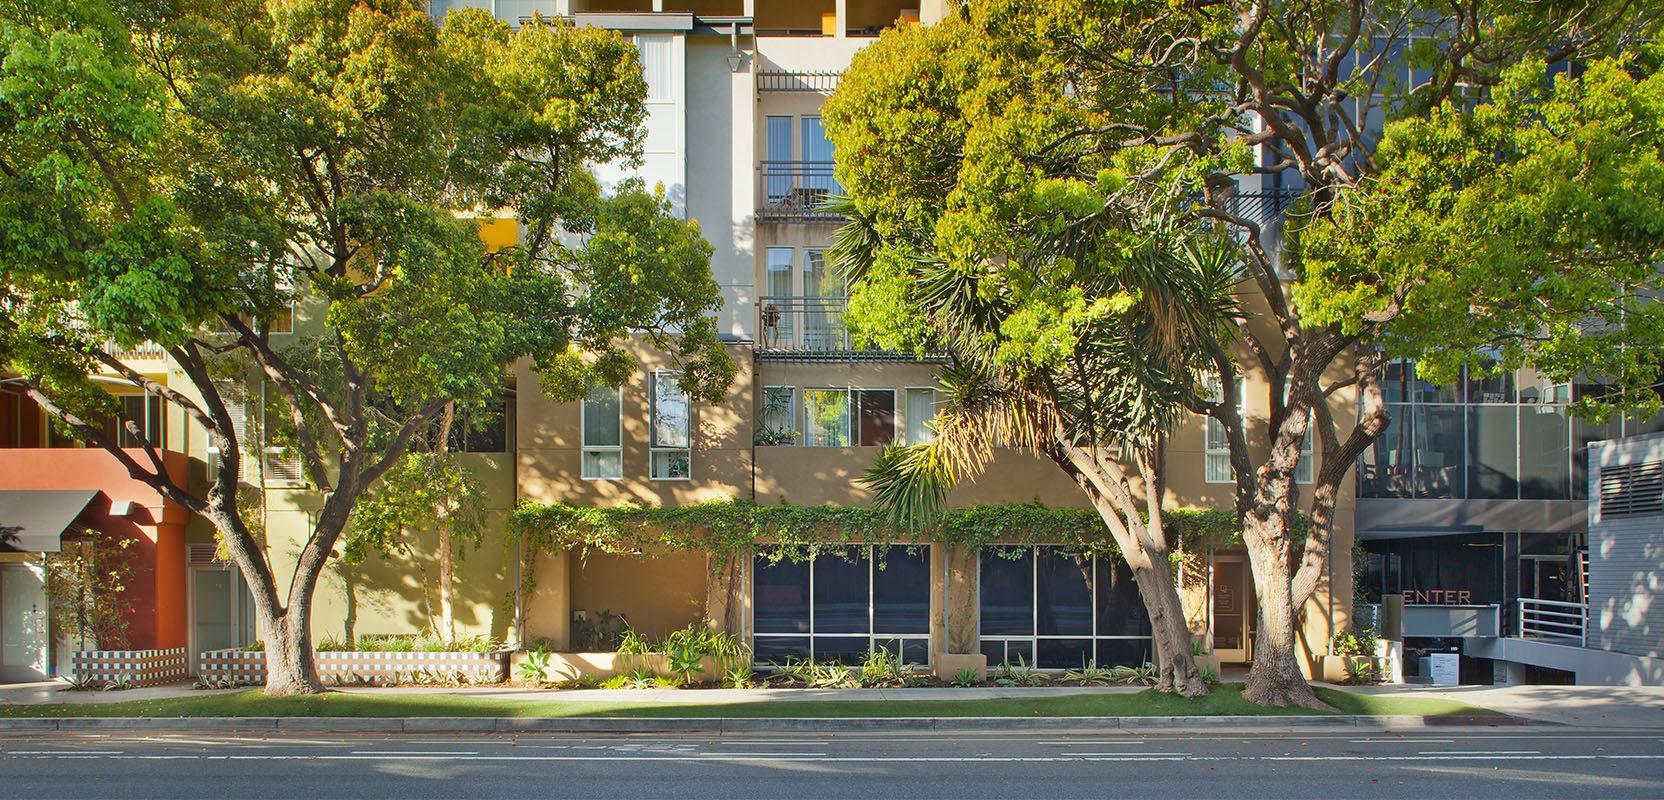 Home | SAMO Apartments | Affordable Apartments in Santa ...